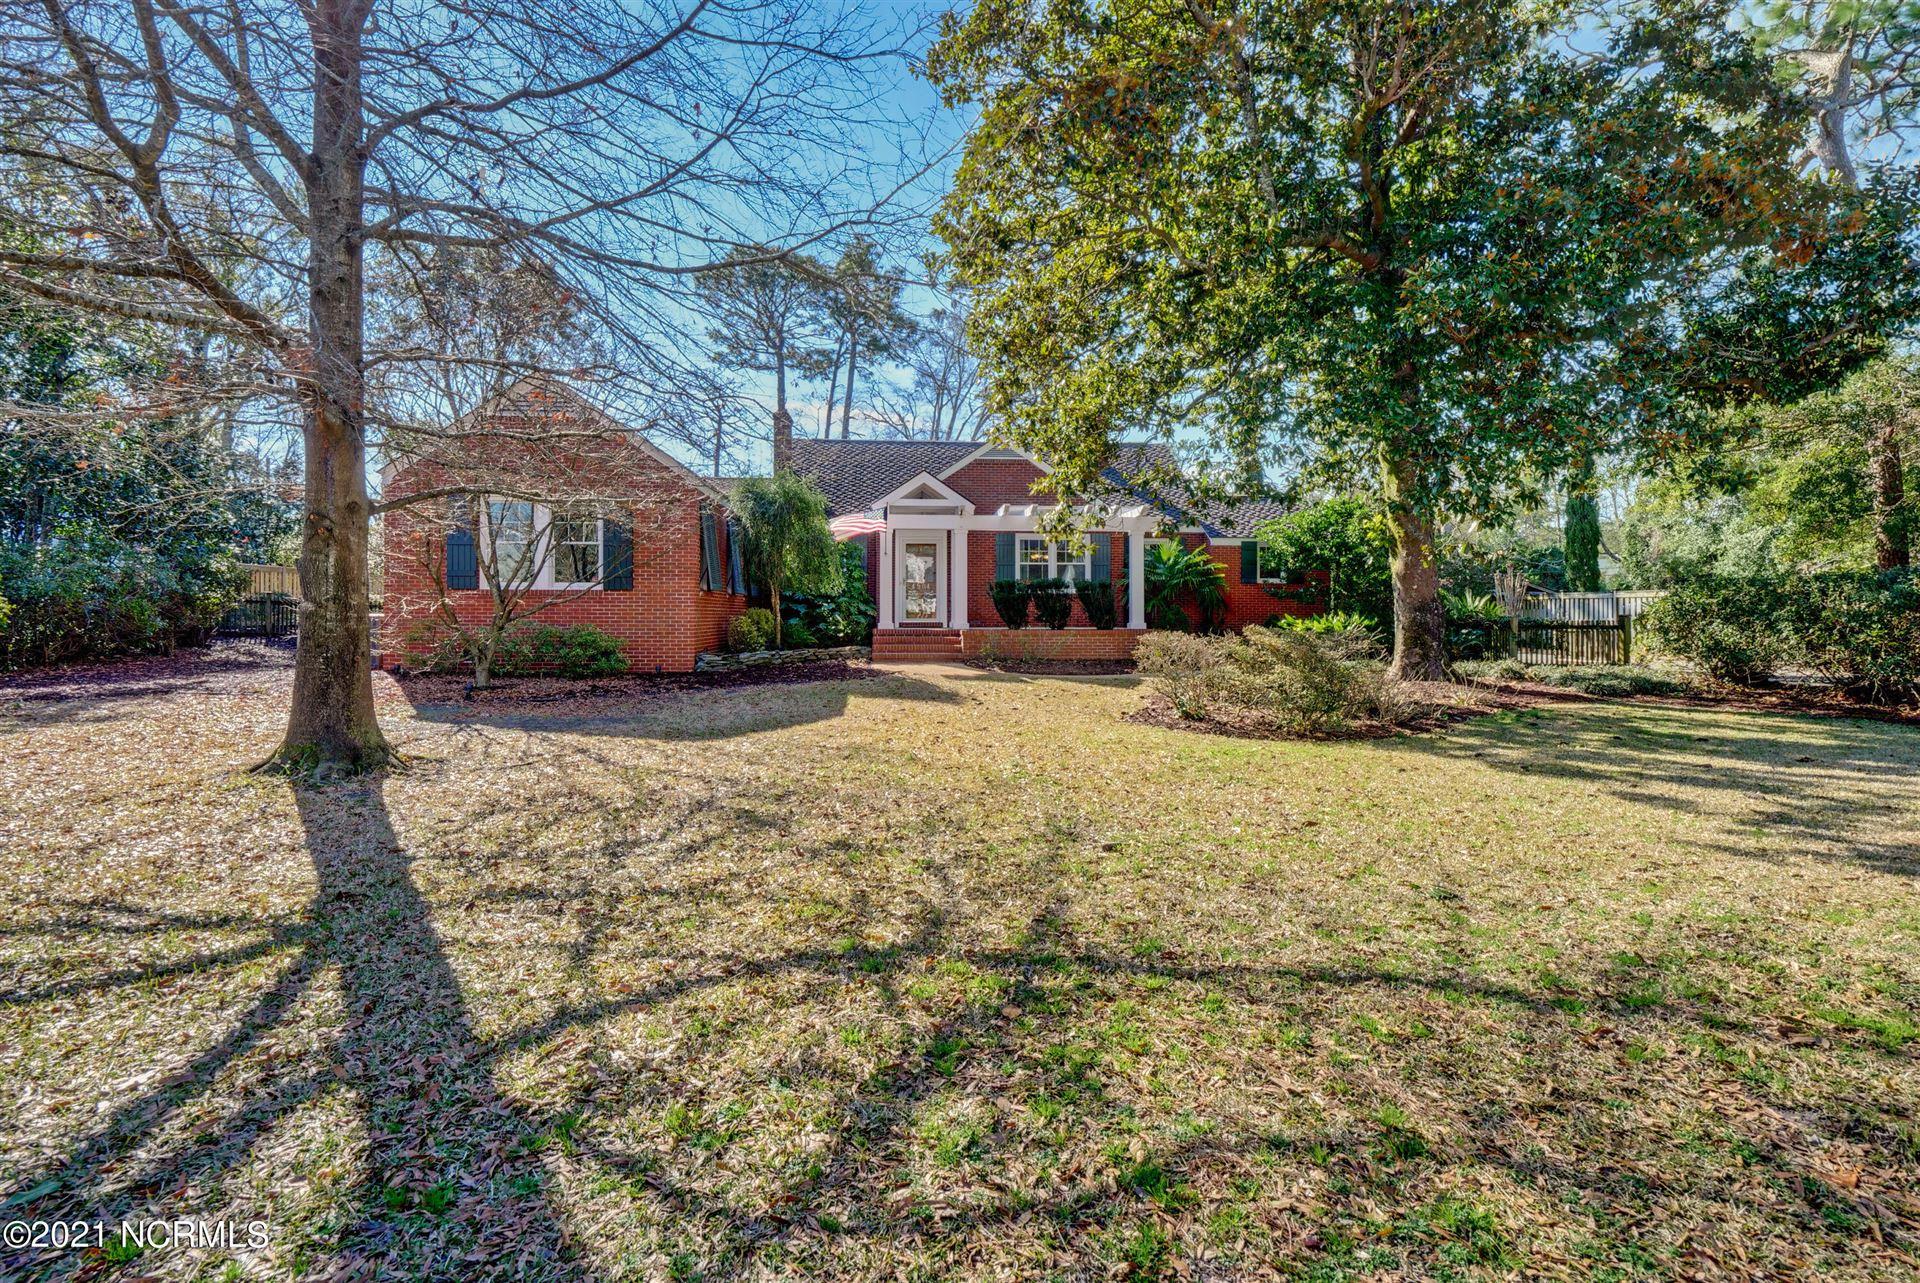 Photo of 4904 Pine Street, Wilmington, NC 28403 (MLS # 100286313)